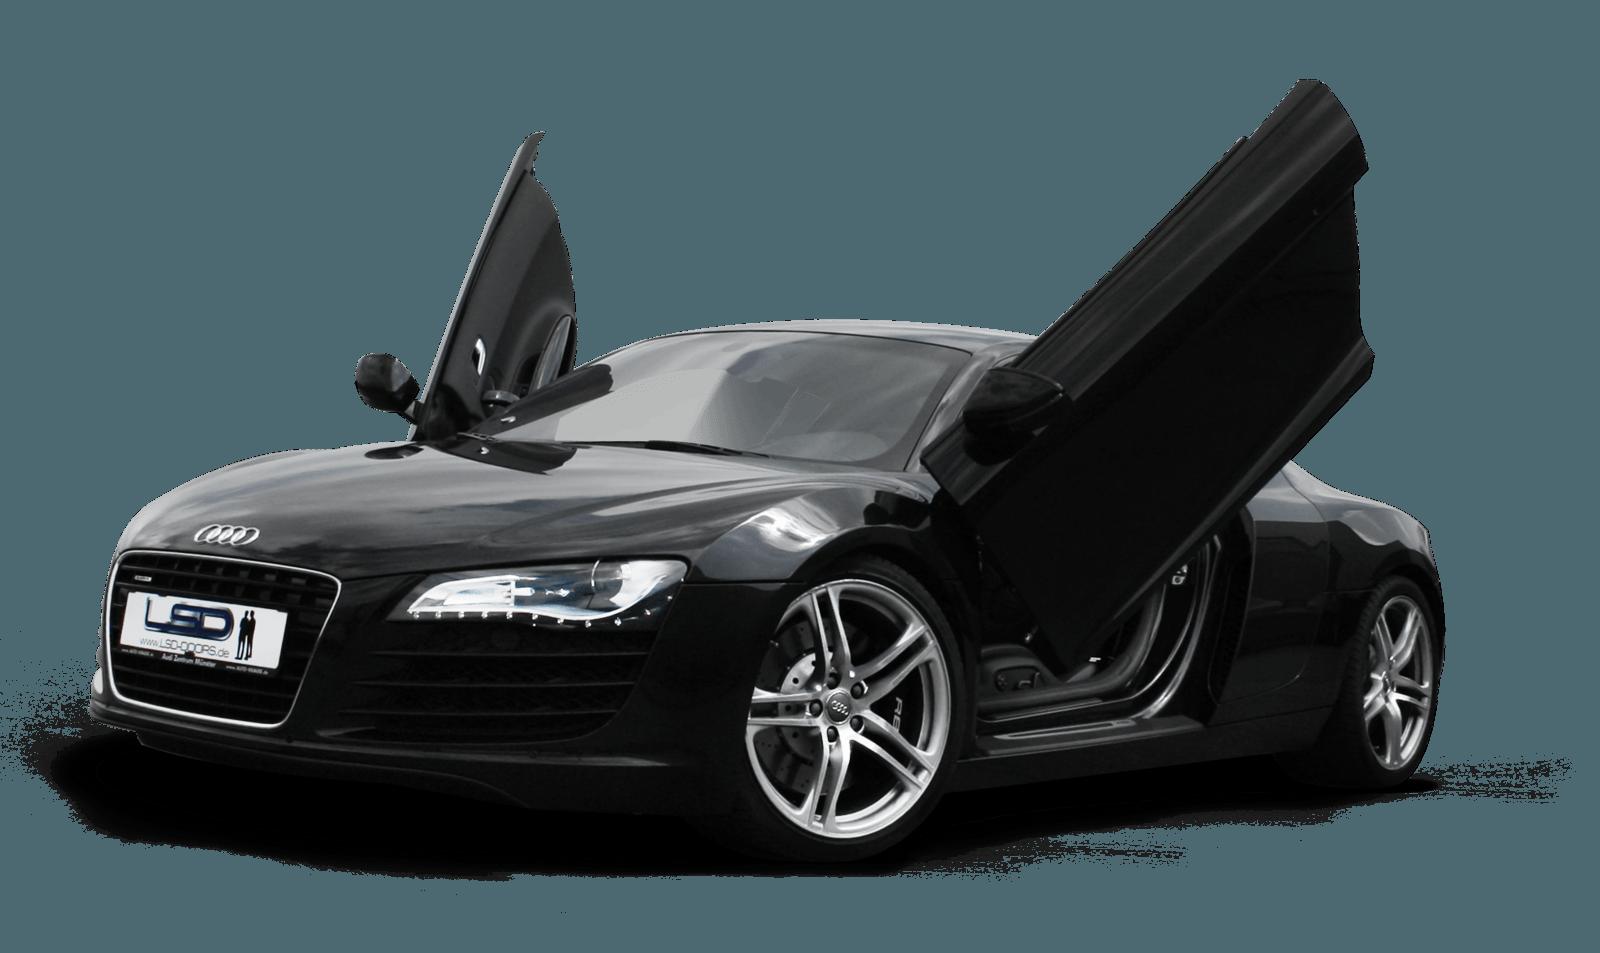 Black R8 Audi Png Car Image PNG Image